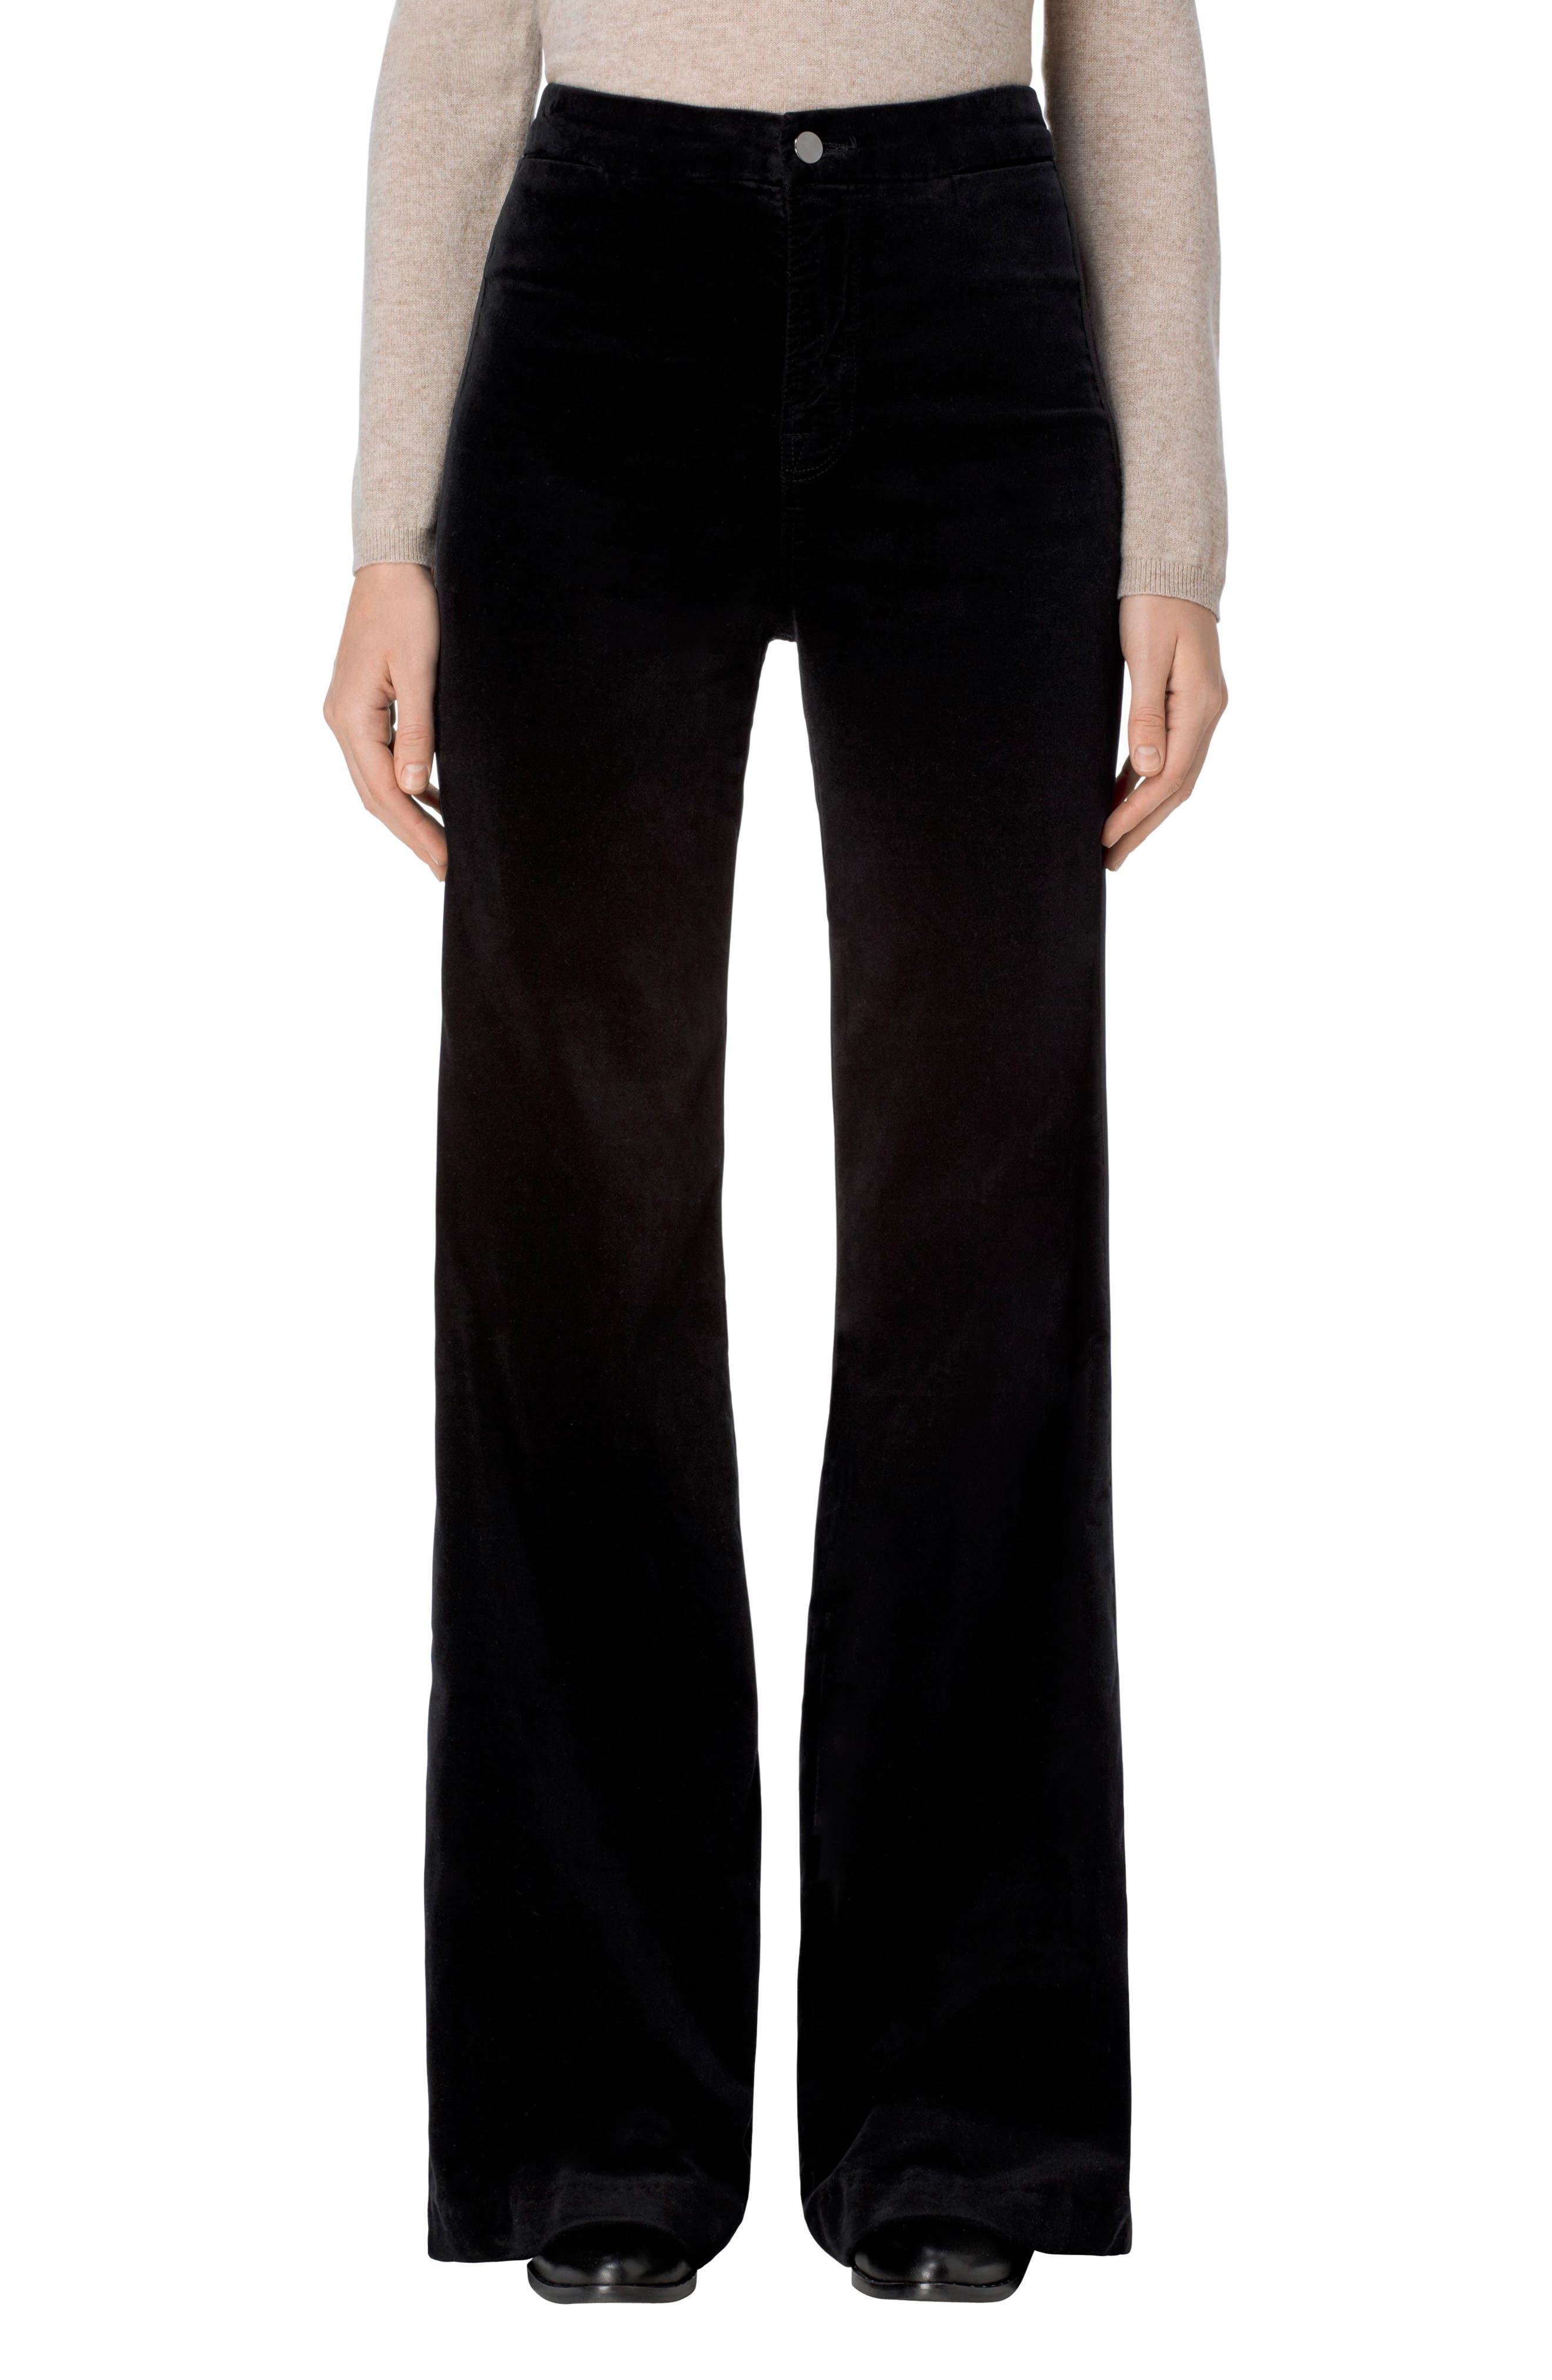 J Brand Isabella High Rise Flare Leg Pants